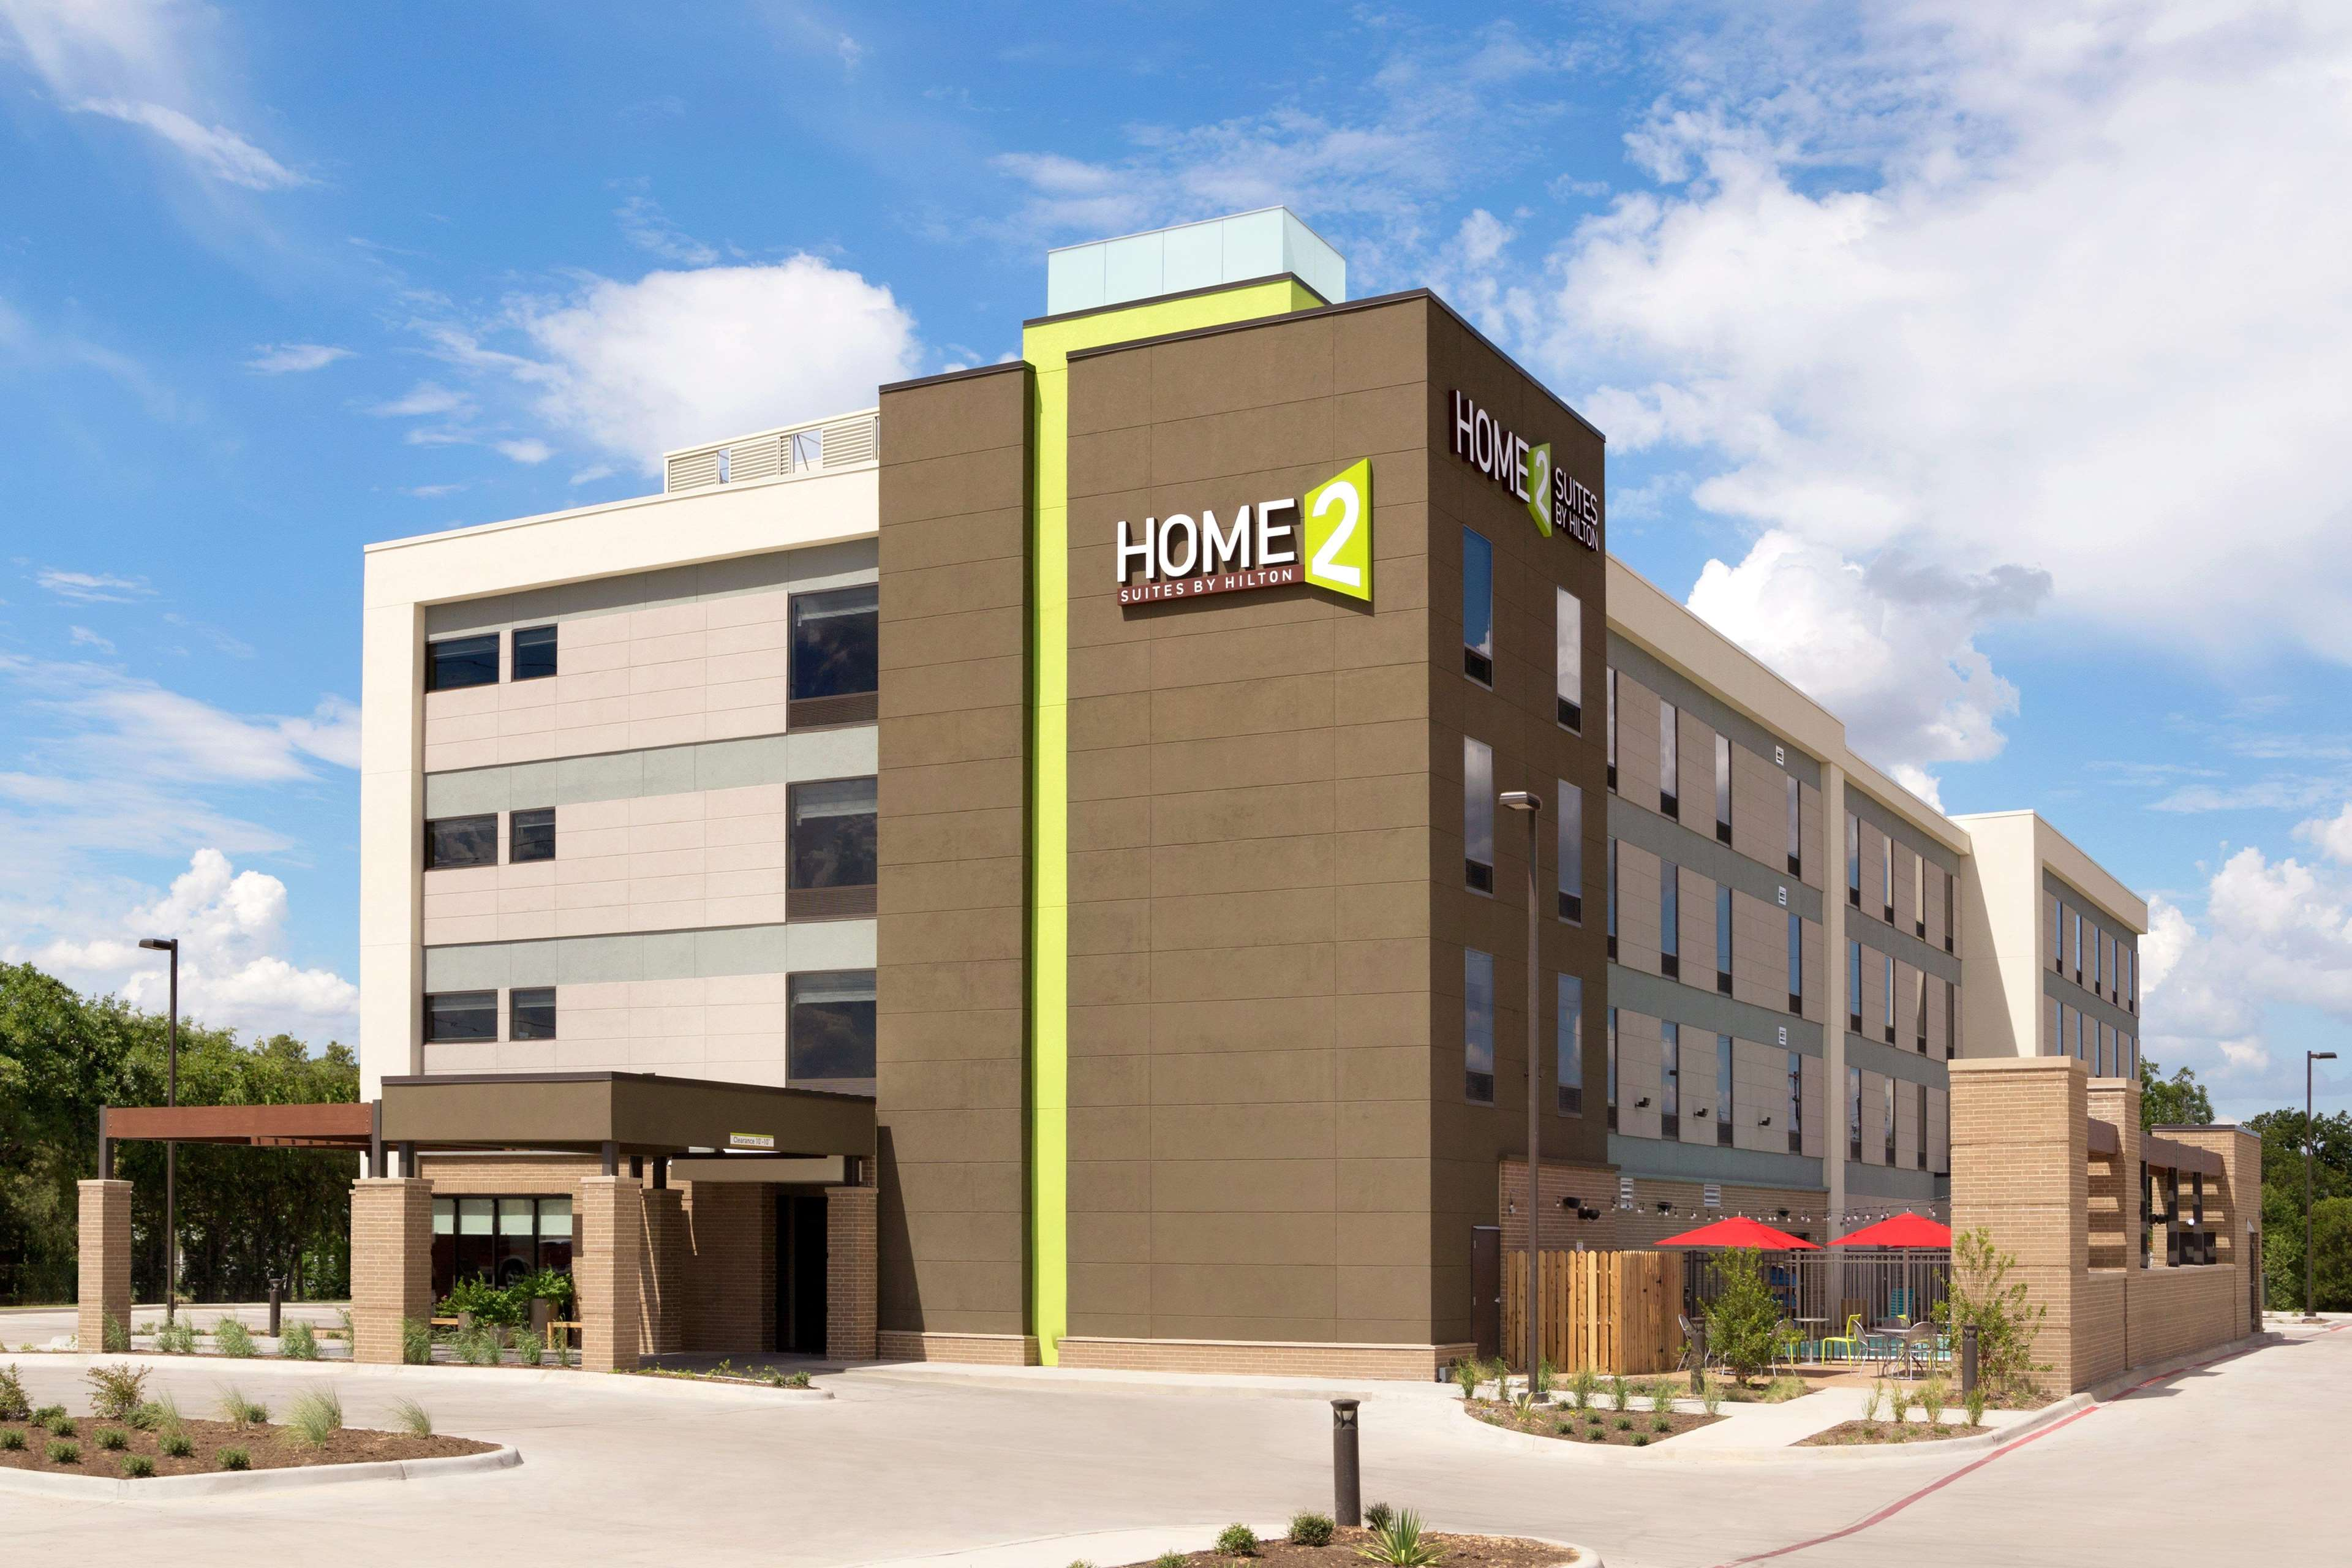 Home2 Suites by Hilton Waco image 0